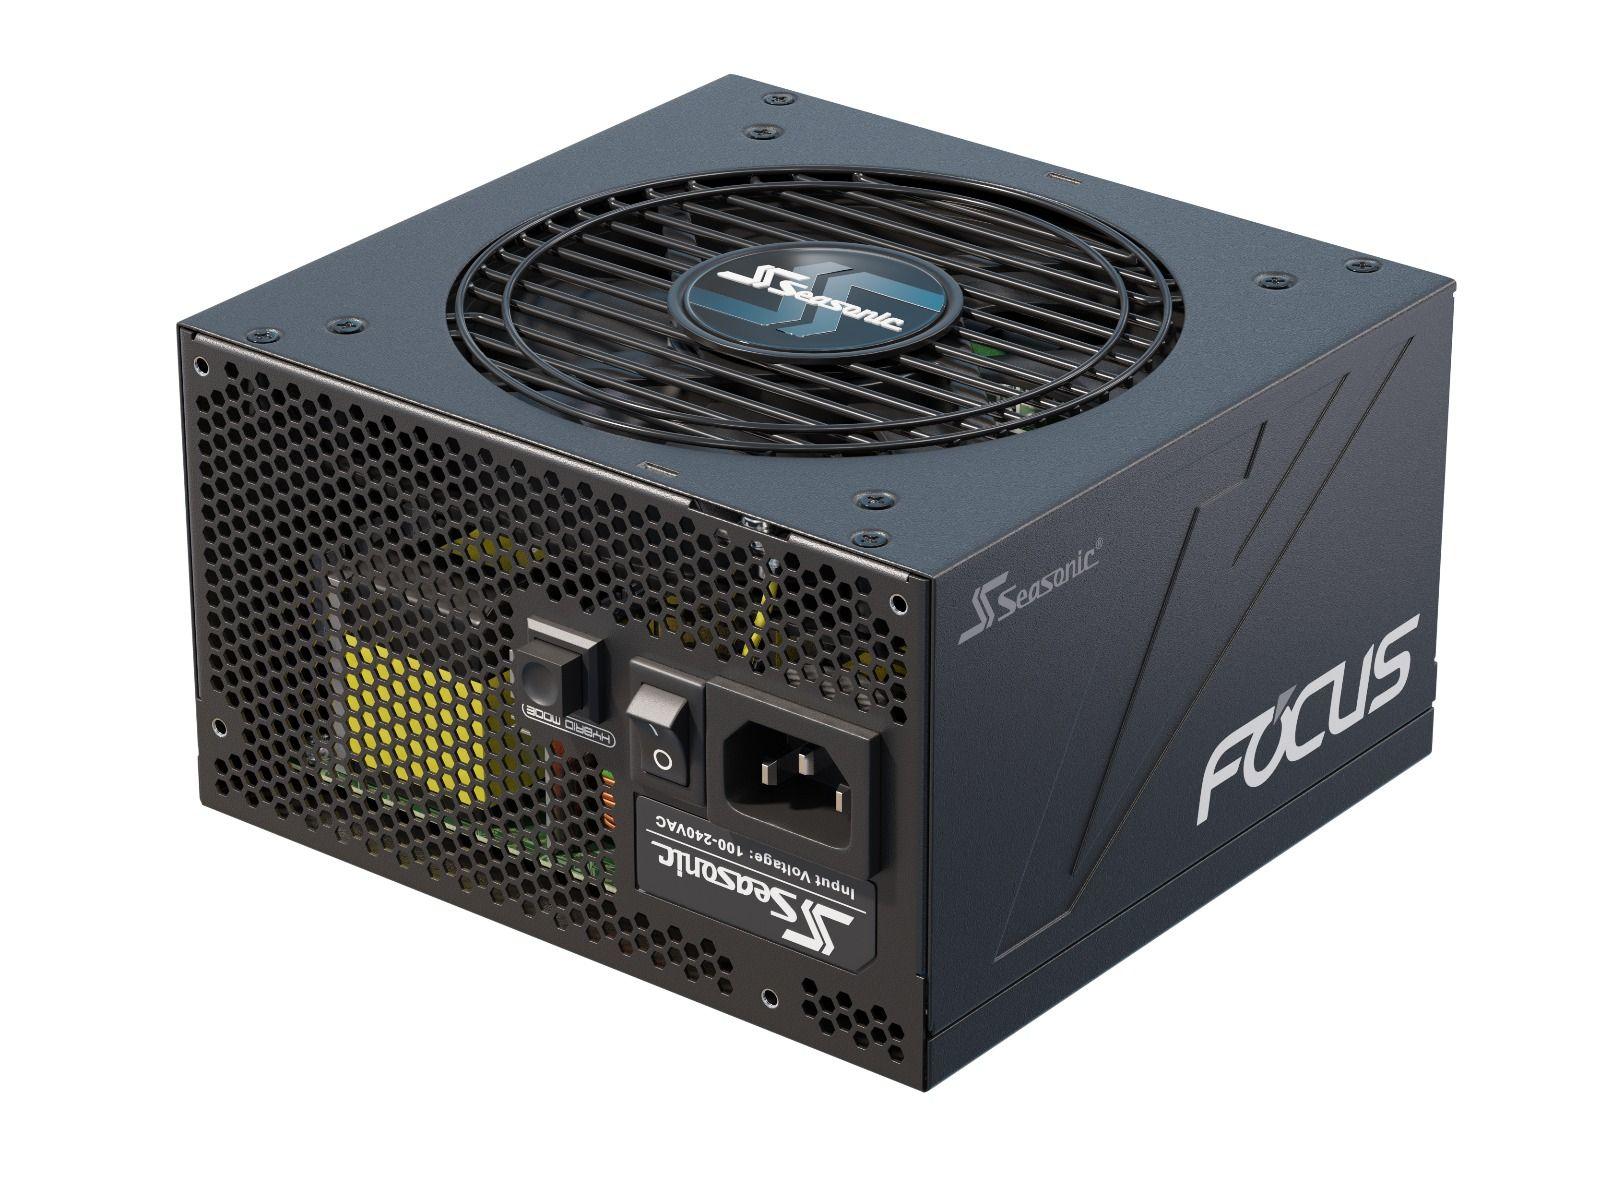 Vorschau: Seasonic Focus GX-1000 - 1000 W - 100 - 240 V - 50/60 Hz - 13 - 6.5 A - 125 W - 996 W